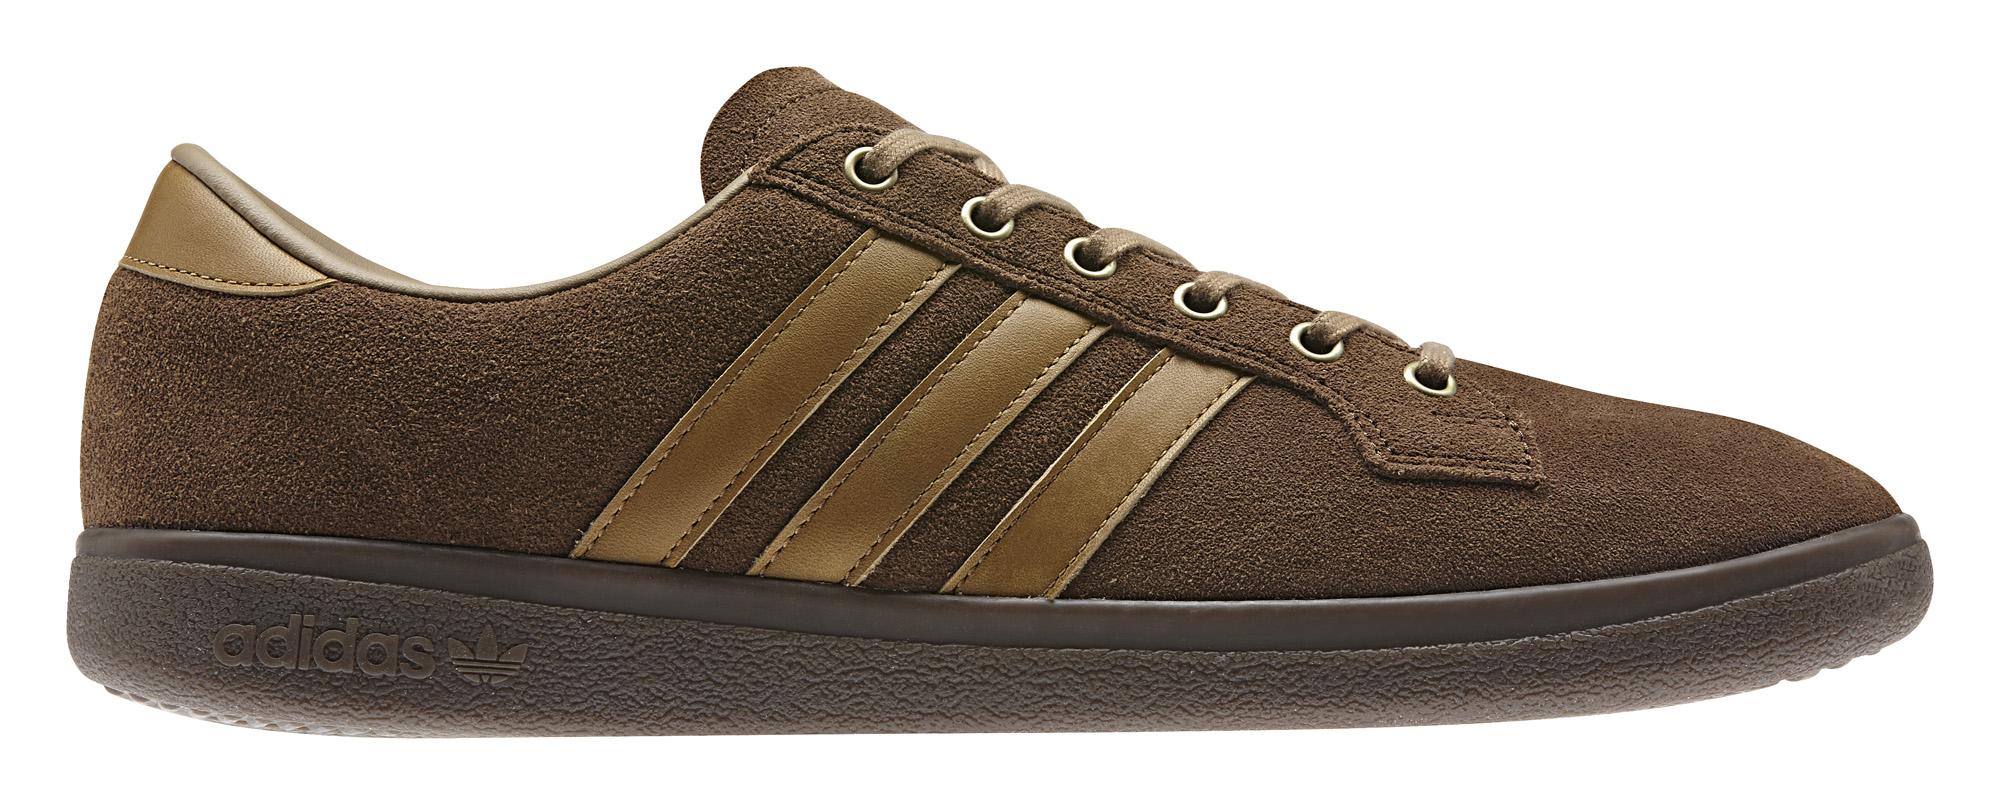 Adidas Spezial Bulhill Brown Profile